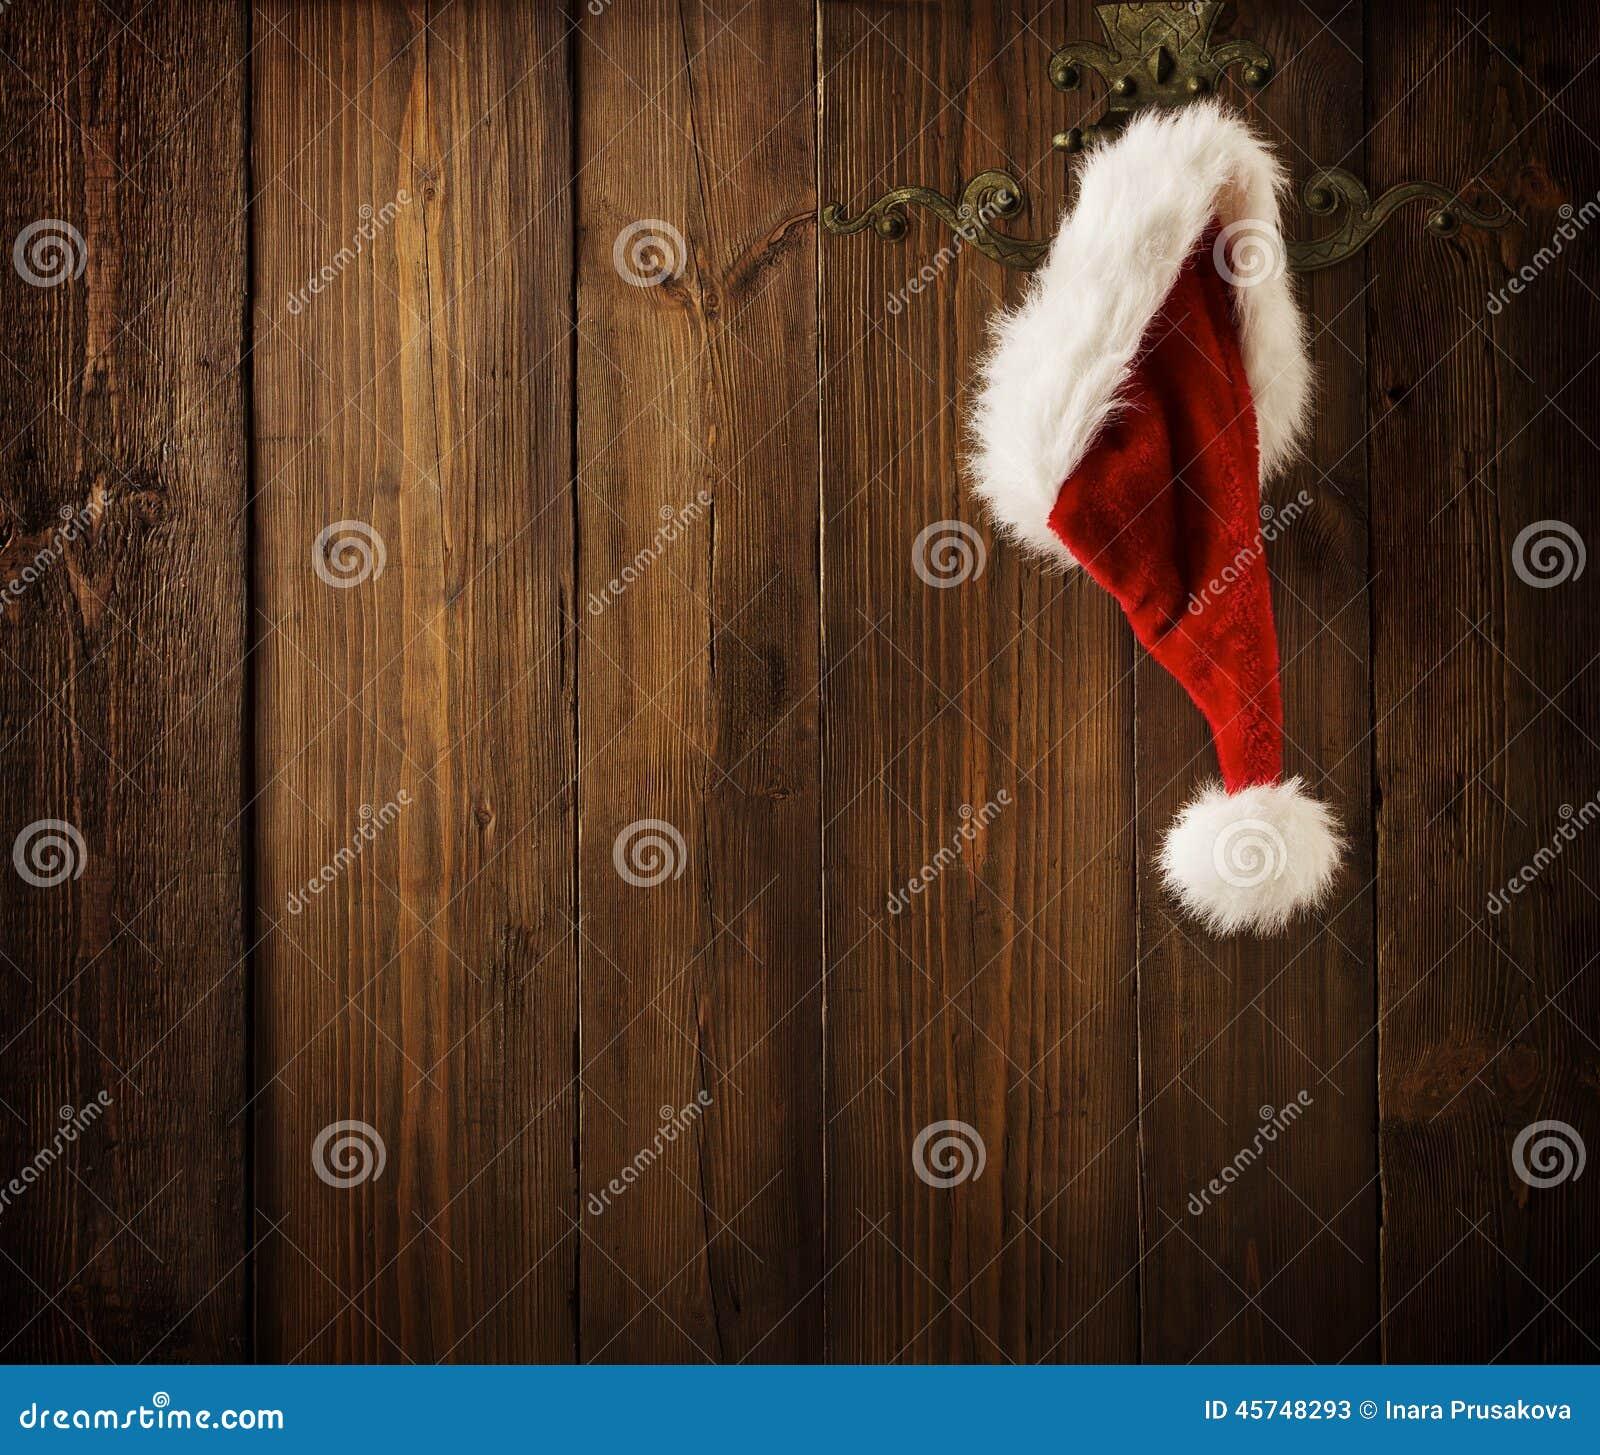 Christmas santa claus hat hanging on wood wall xmas concept stock photo image 45748293 - Grune dekoration ...